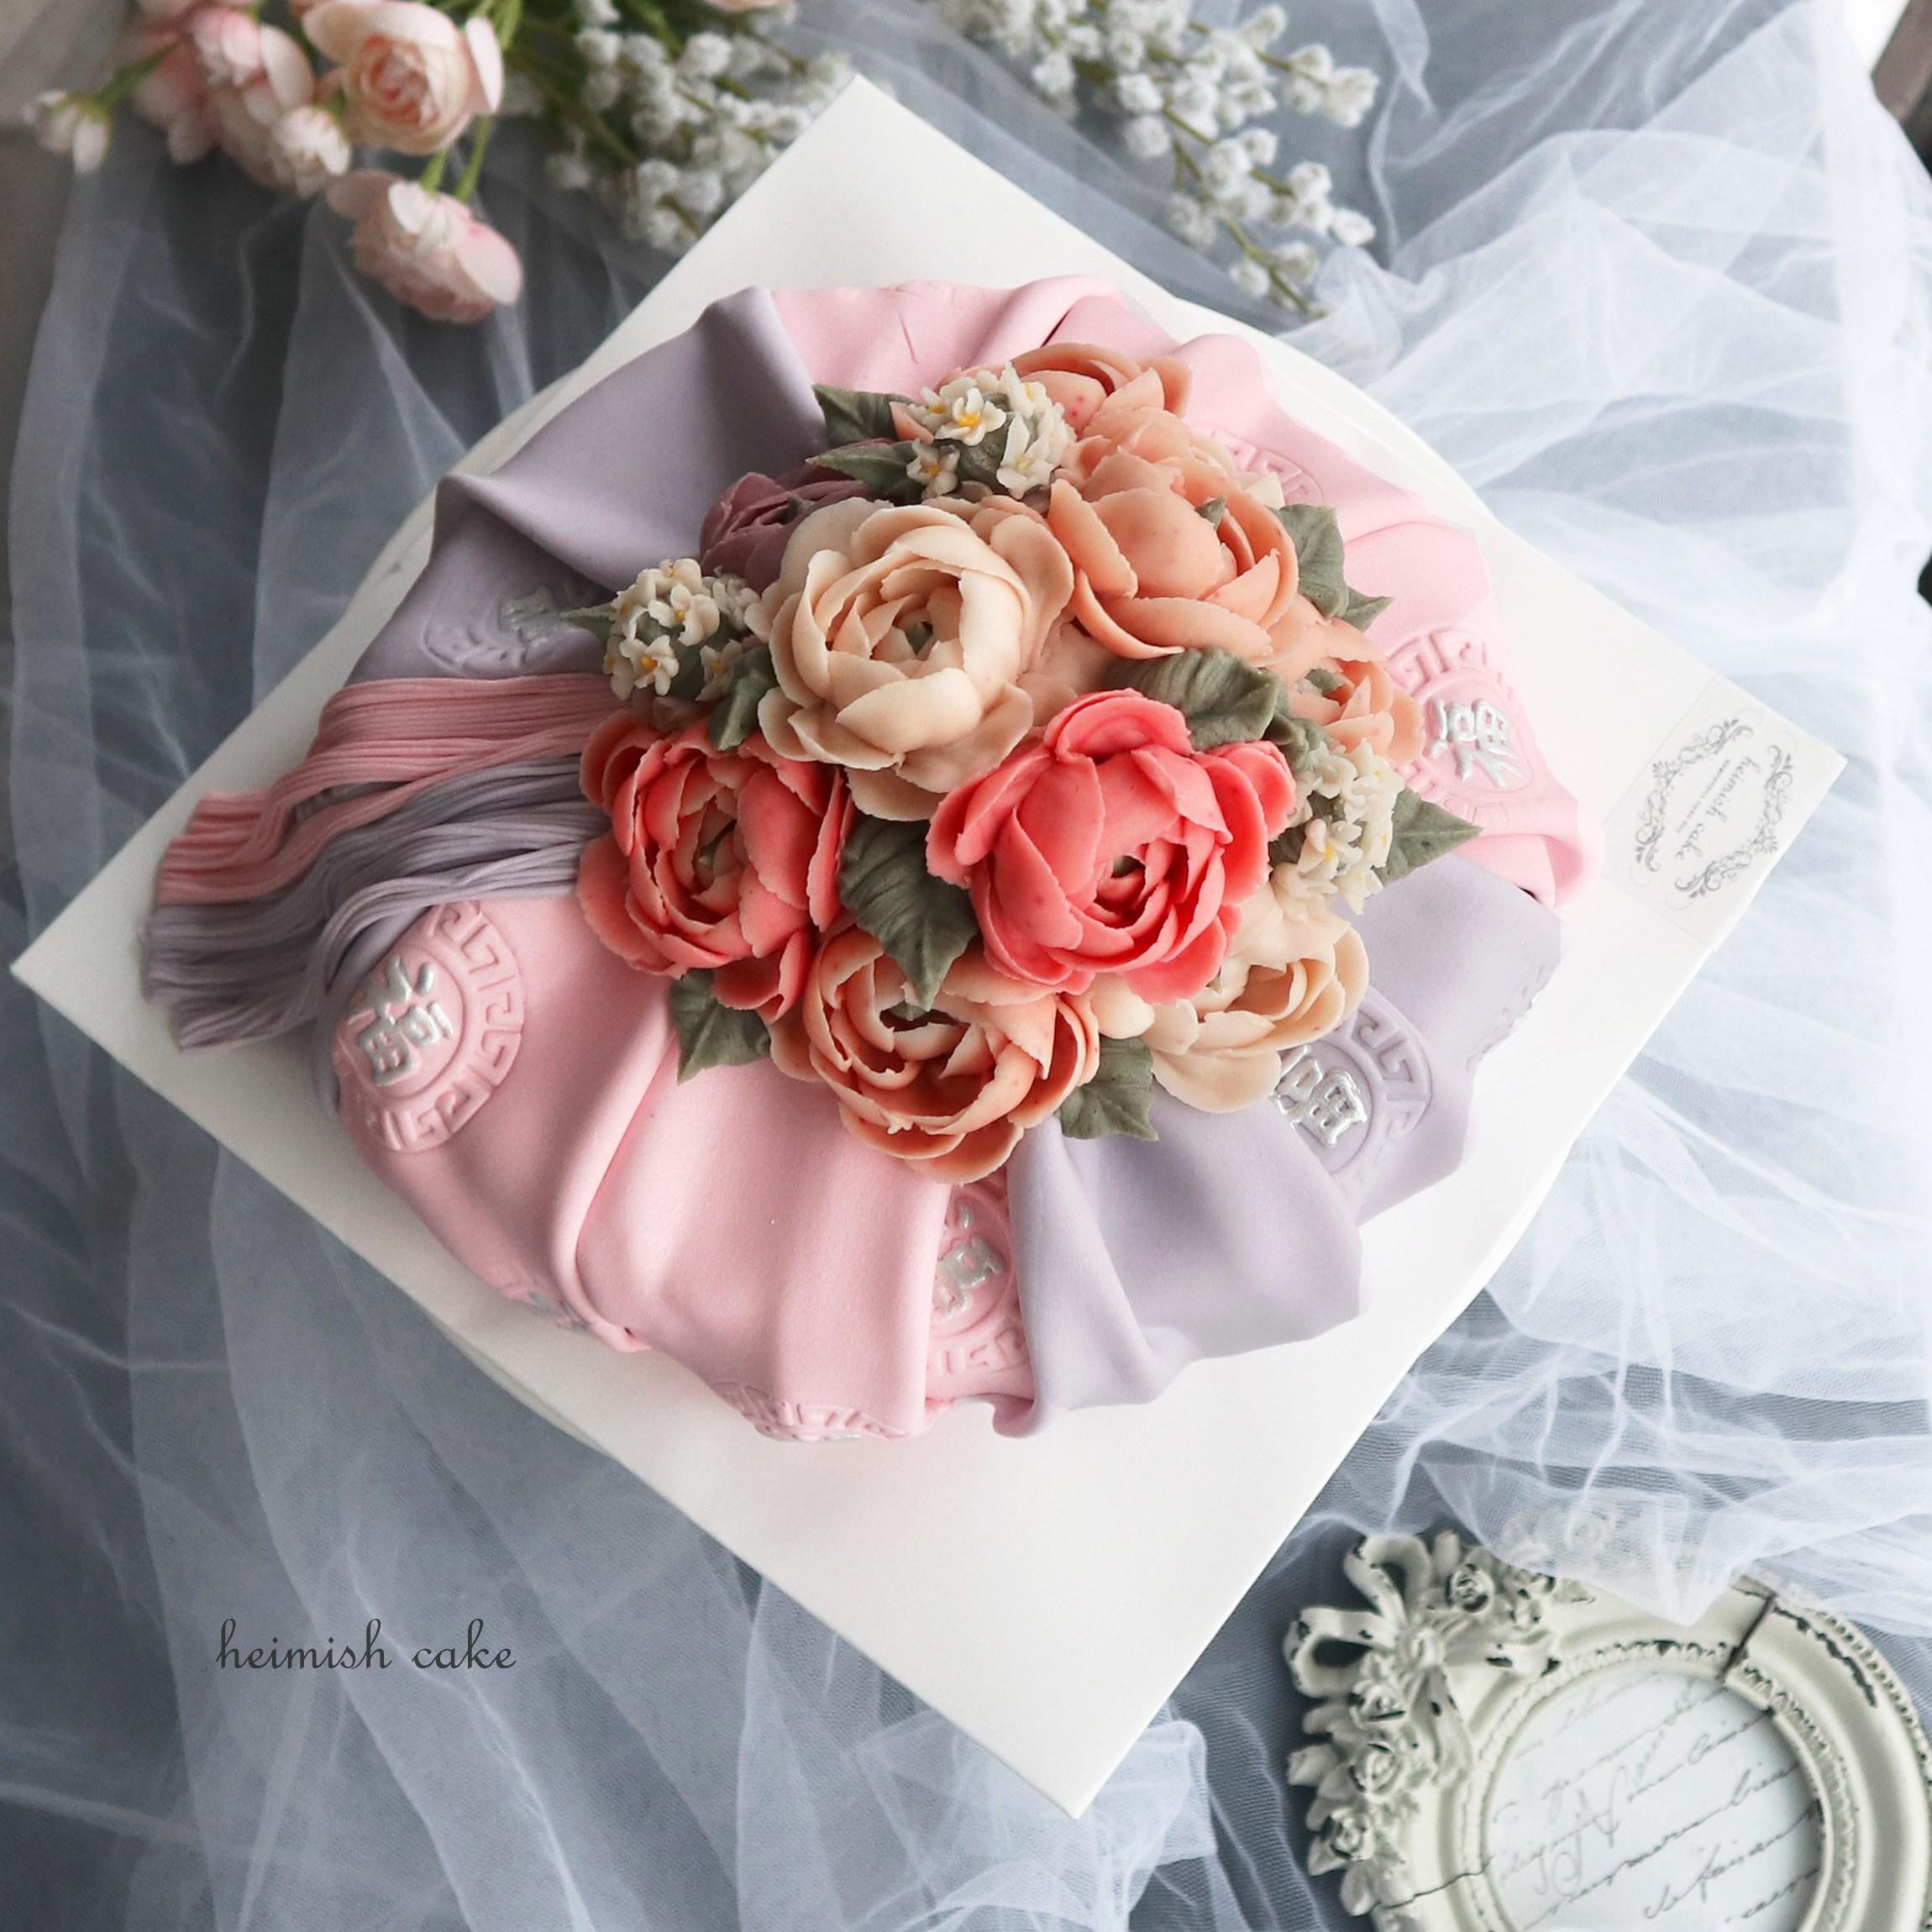 HEIMISH CAKE 앙금보자기떡케이크 - 꽃소담 PINK, 1개